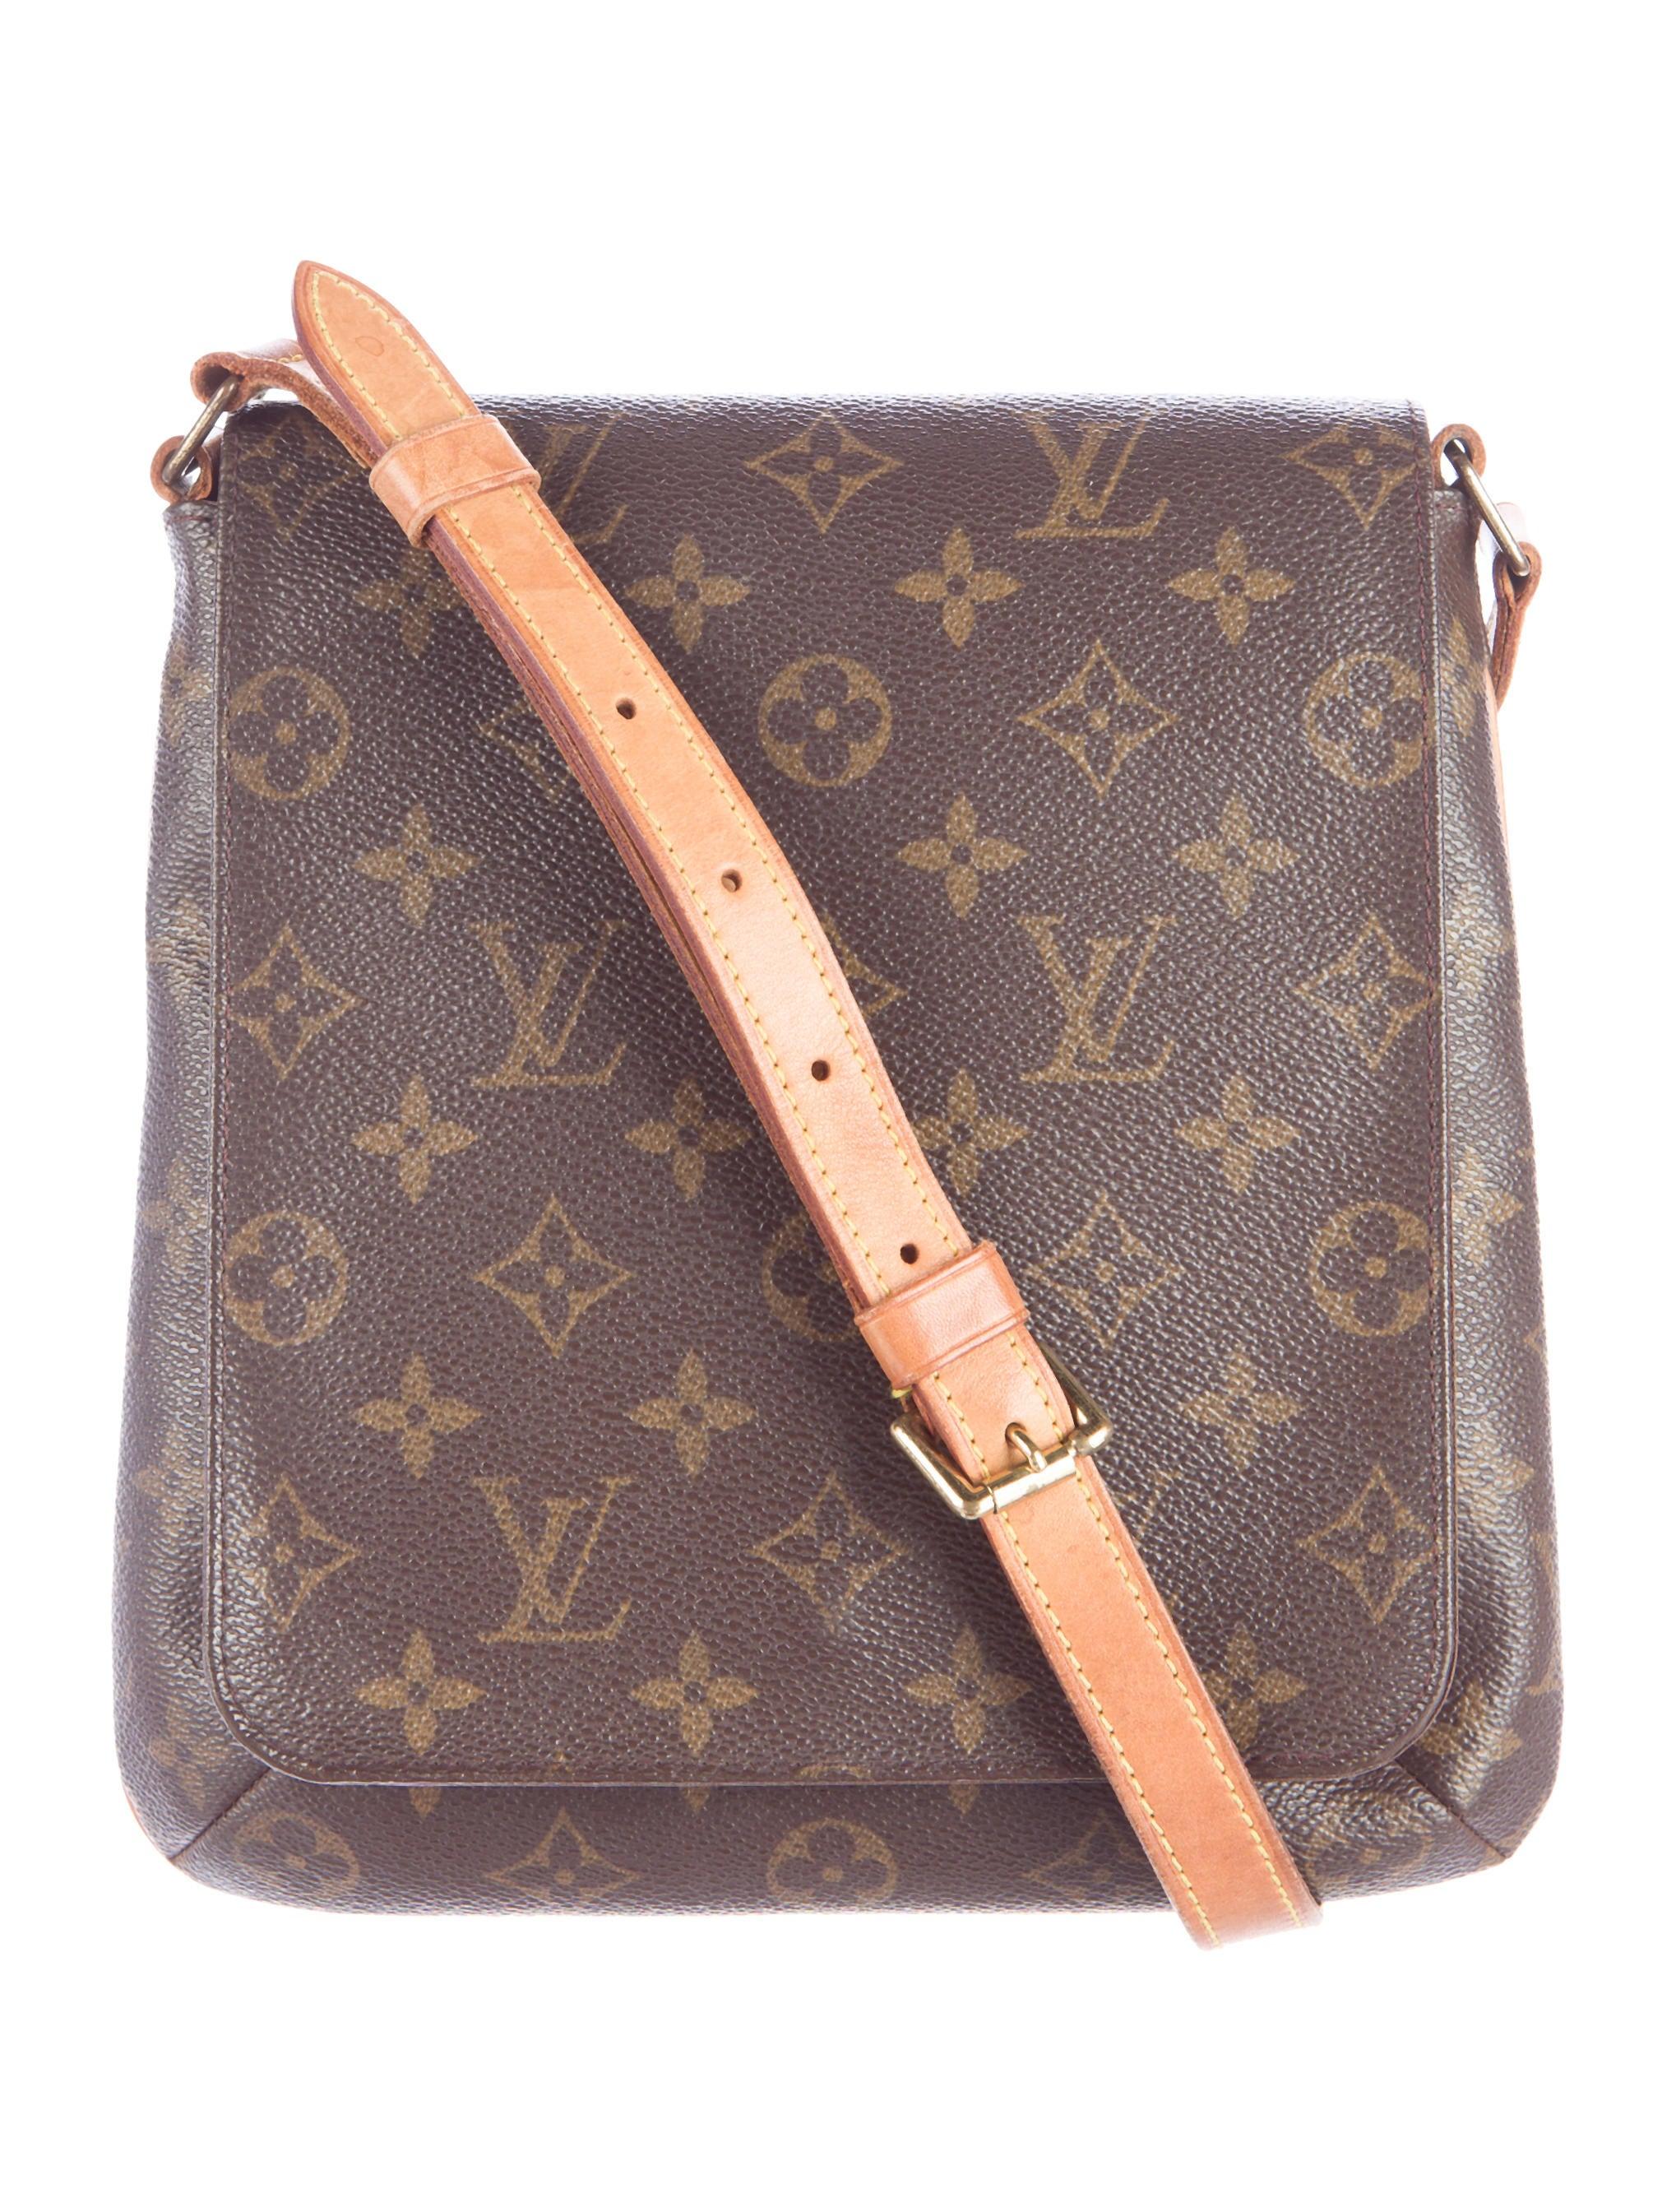 Louis Vuitton Monogram Musette Salsa PM - Handbags - LOU85408  65bd7b1e8d312